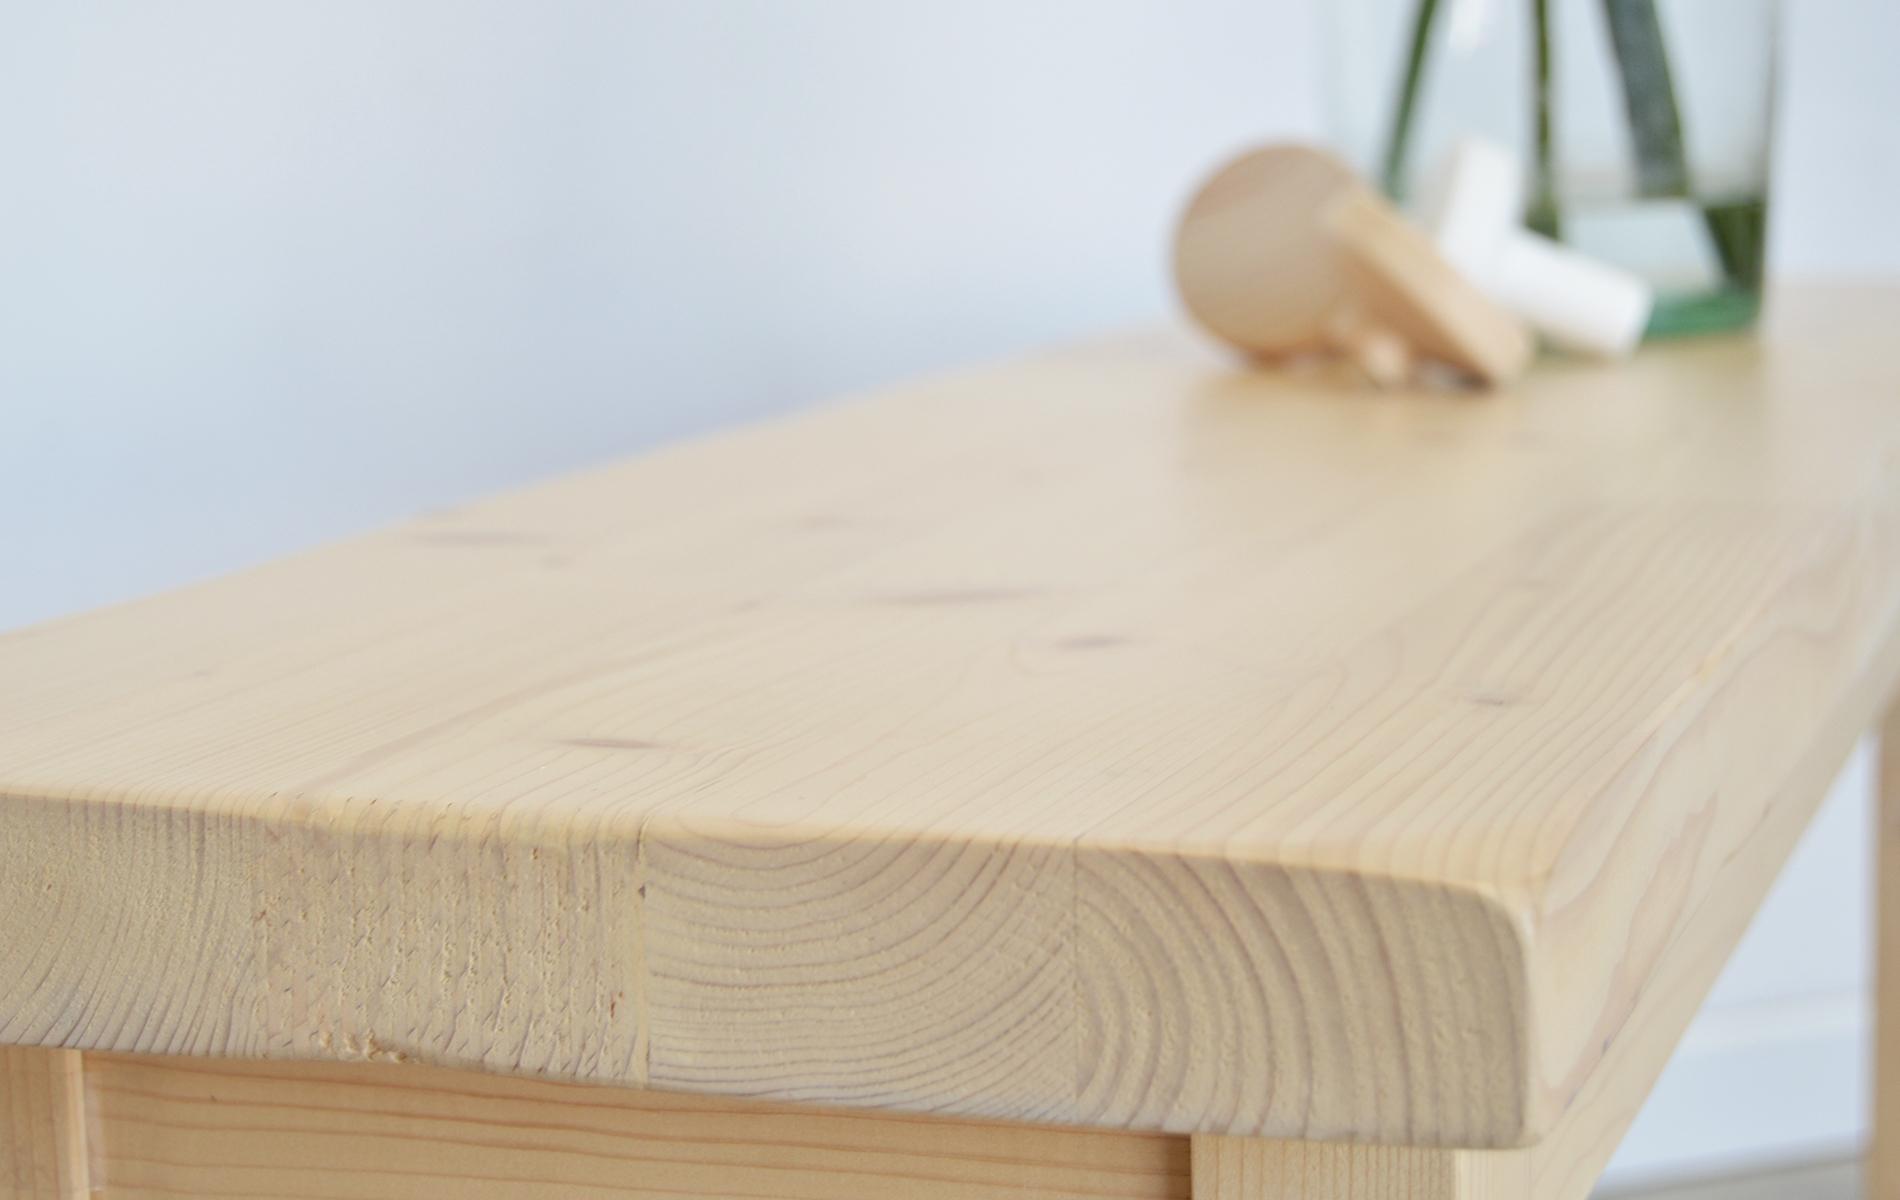 detalle tapa banco madera